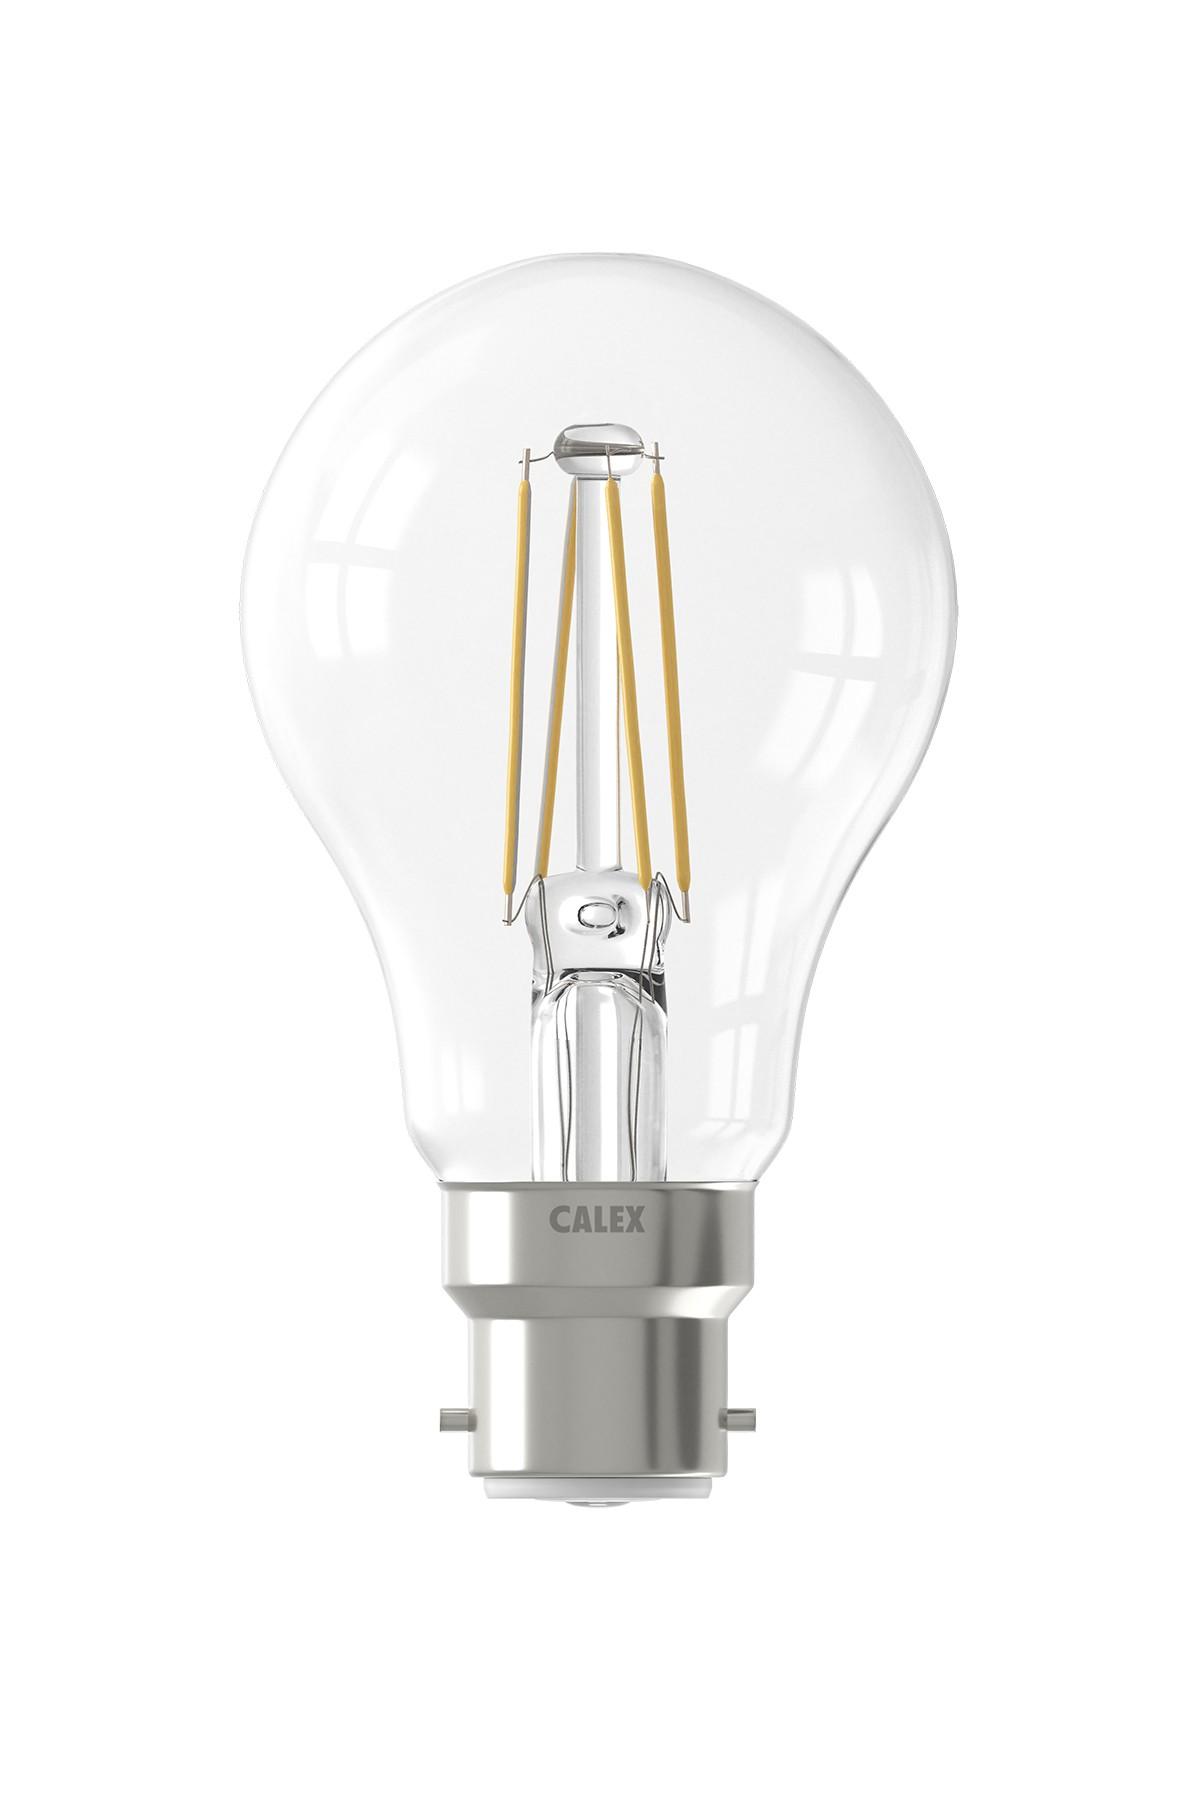 Dimmable Filament LED Standard Lamp 240V 7W B22